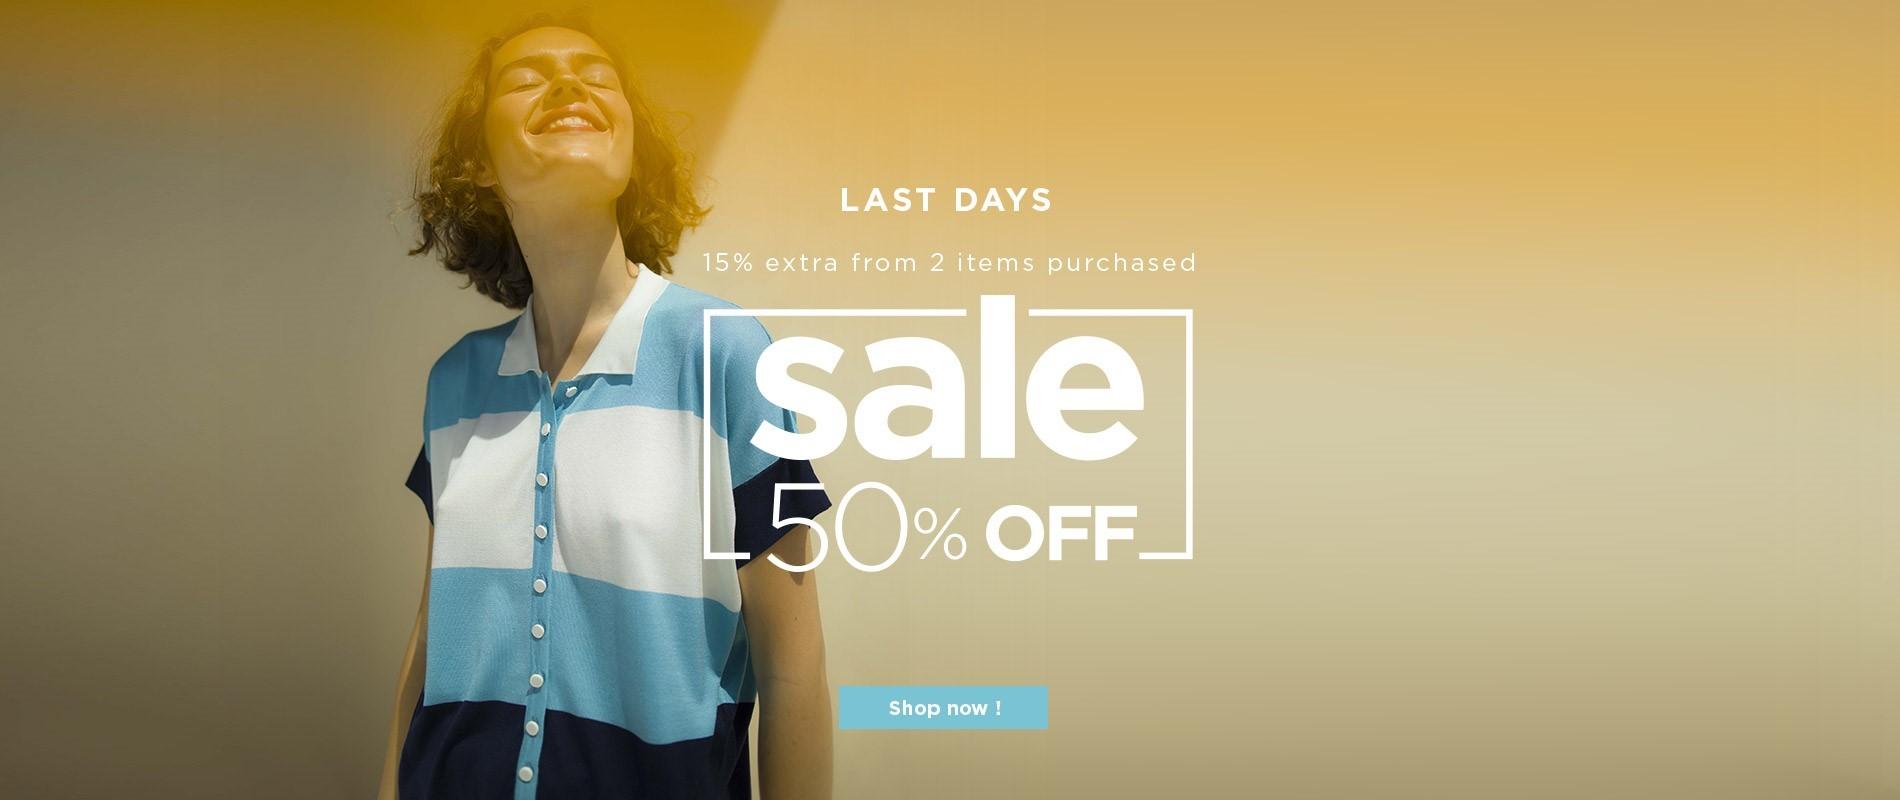 Enjoy our Summer Sales, last days !